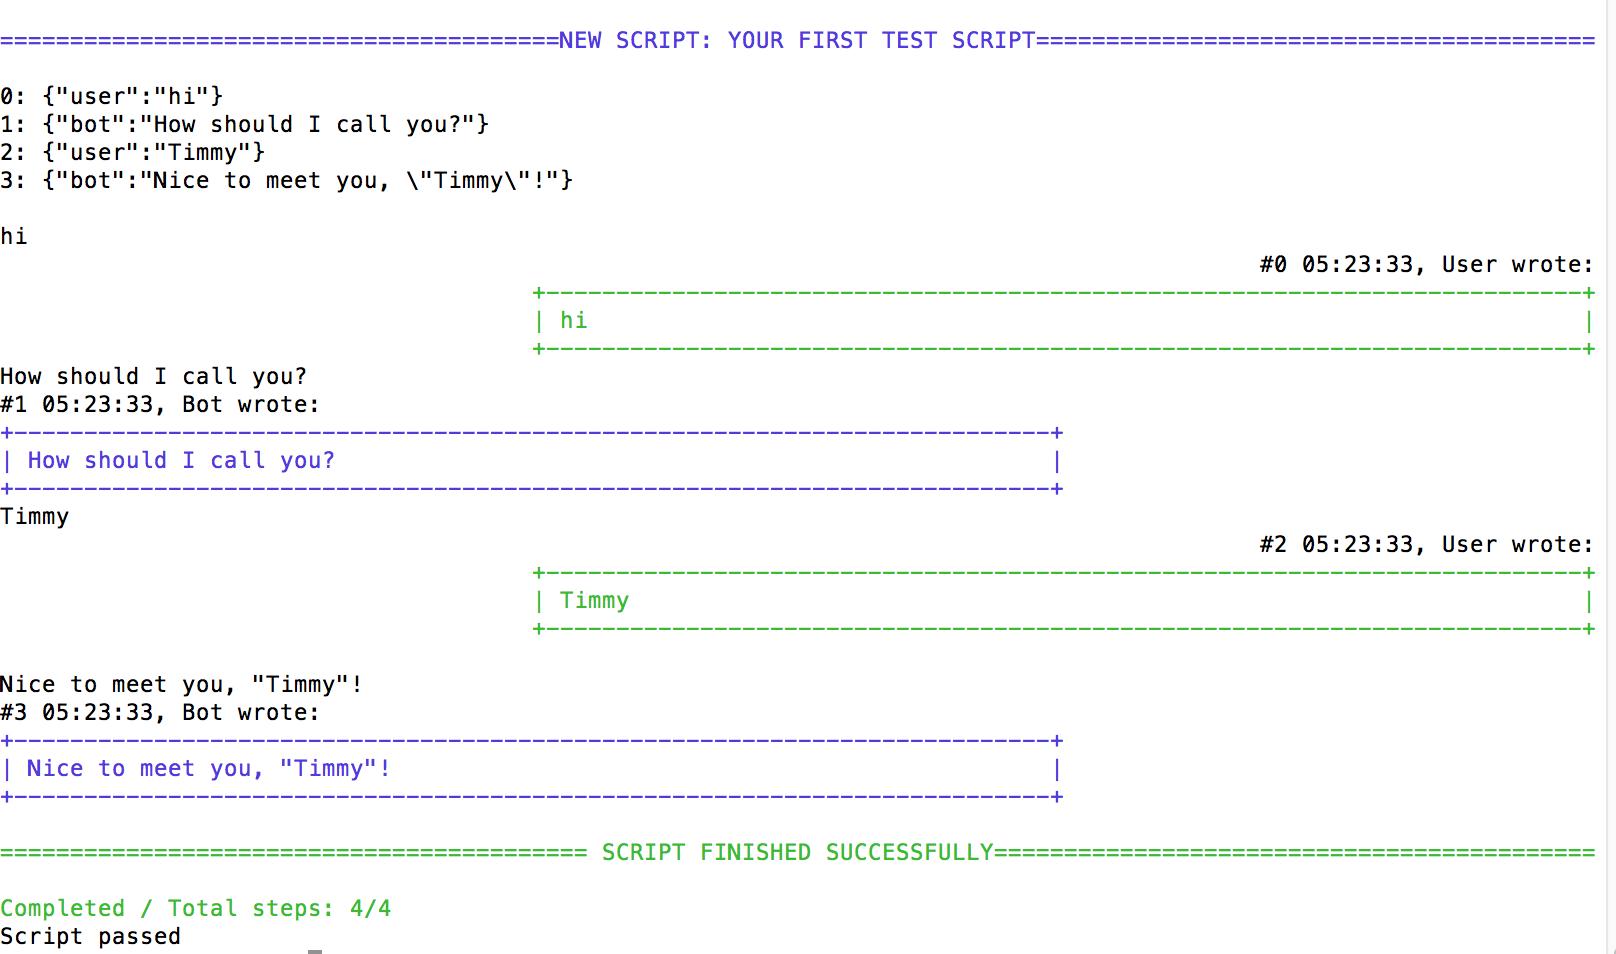 Script output for sample script